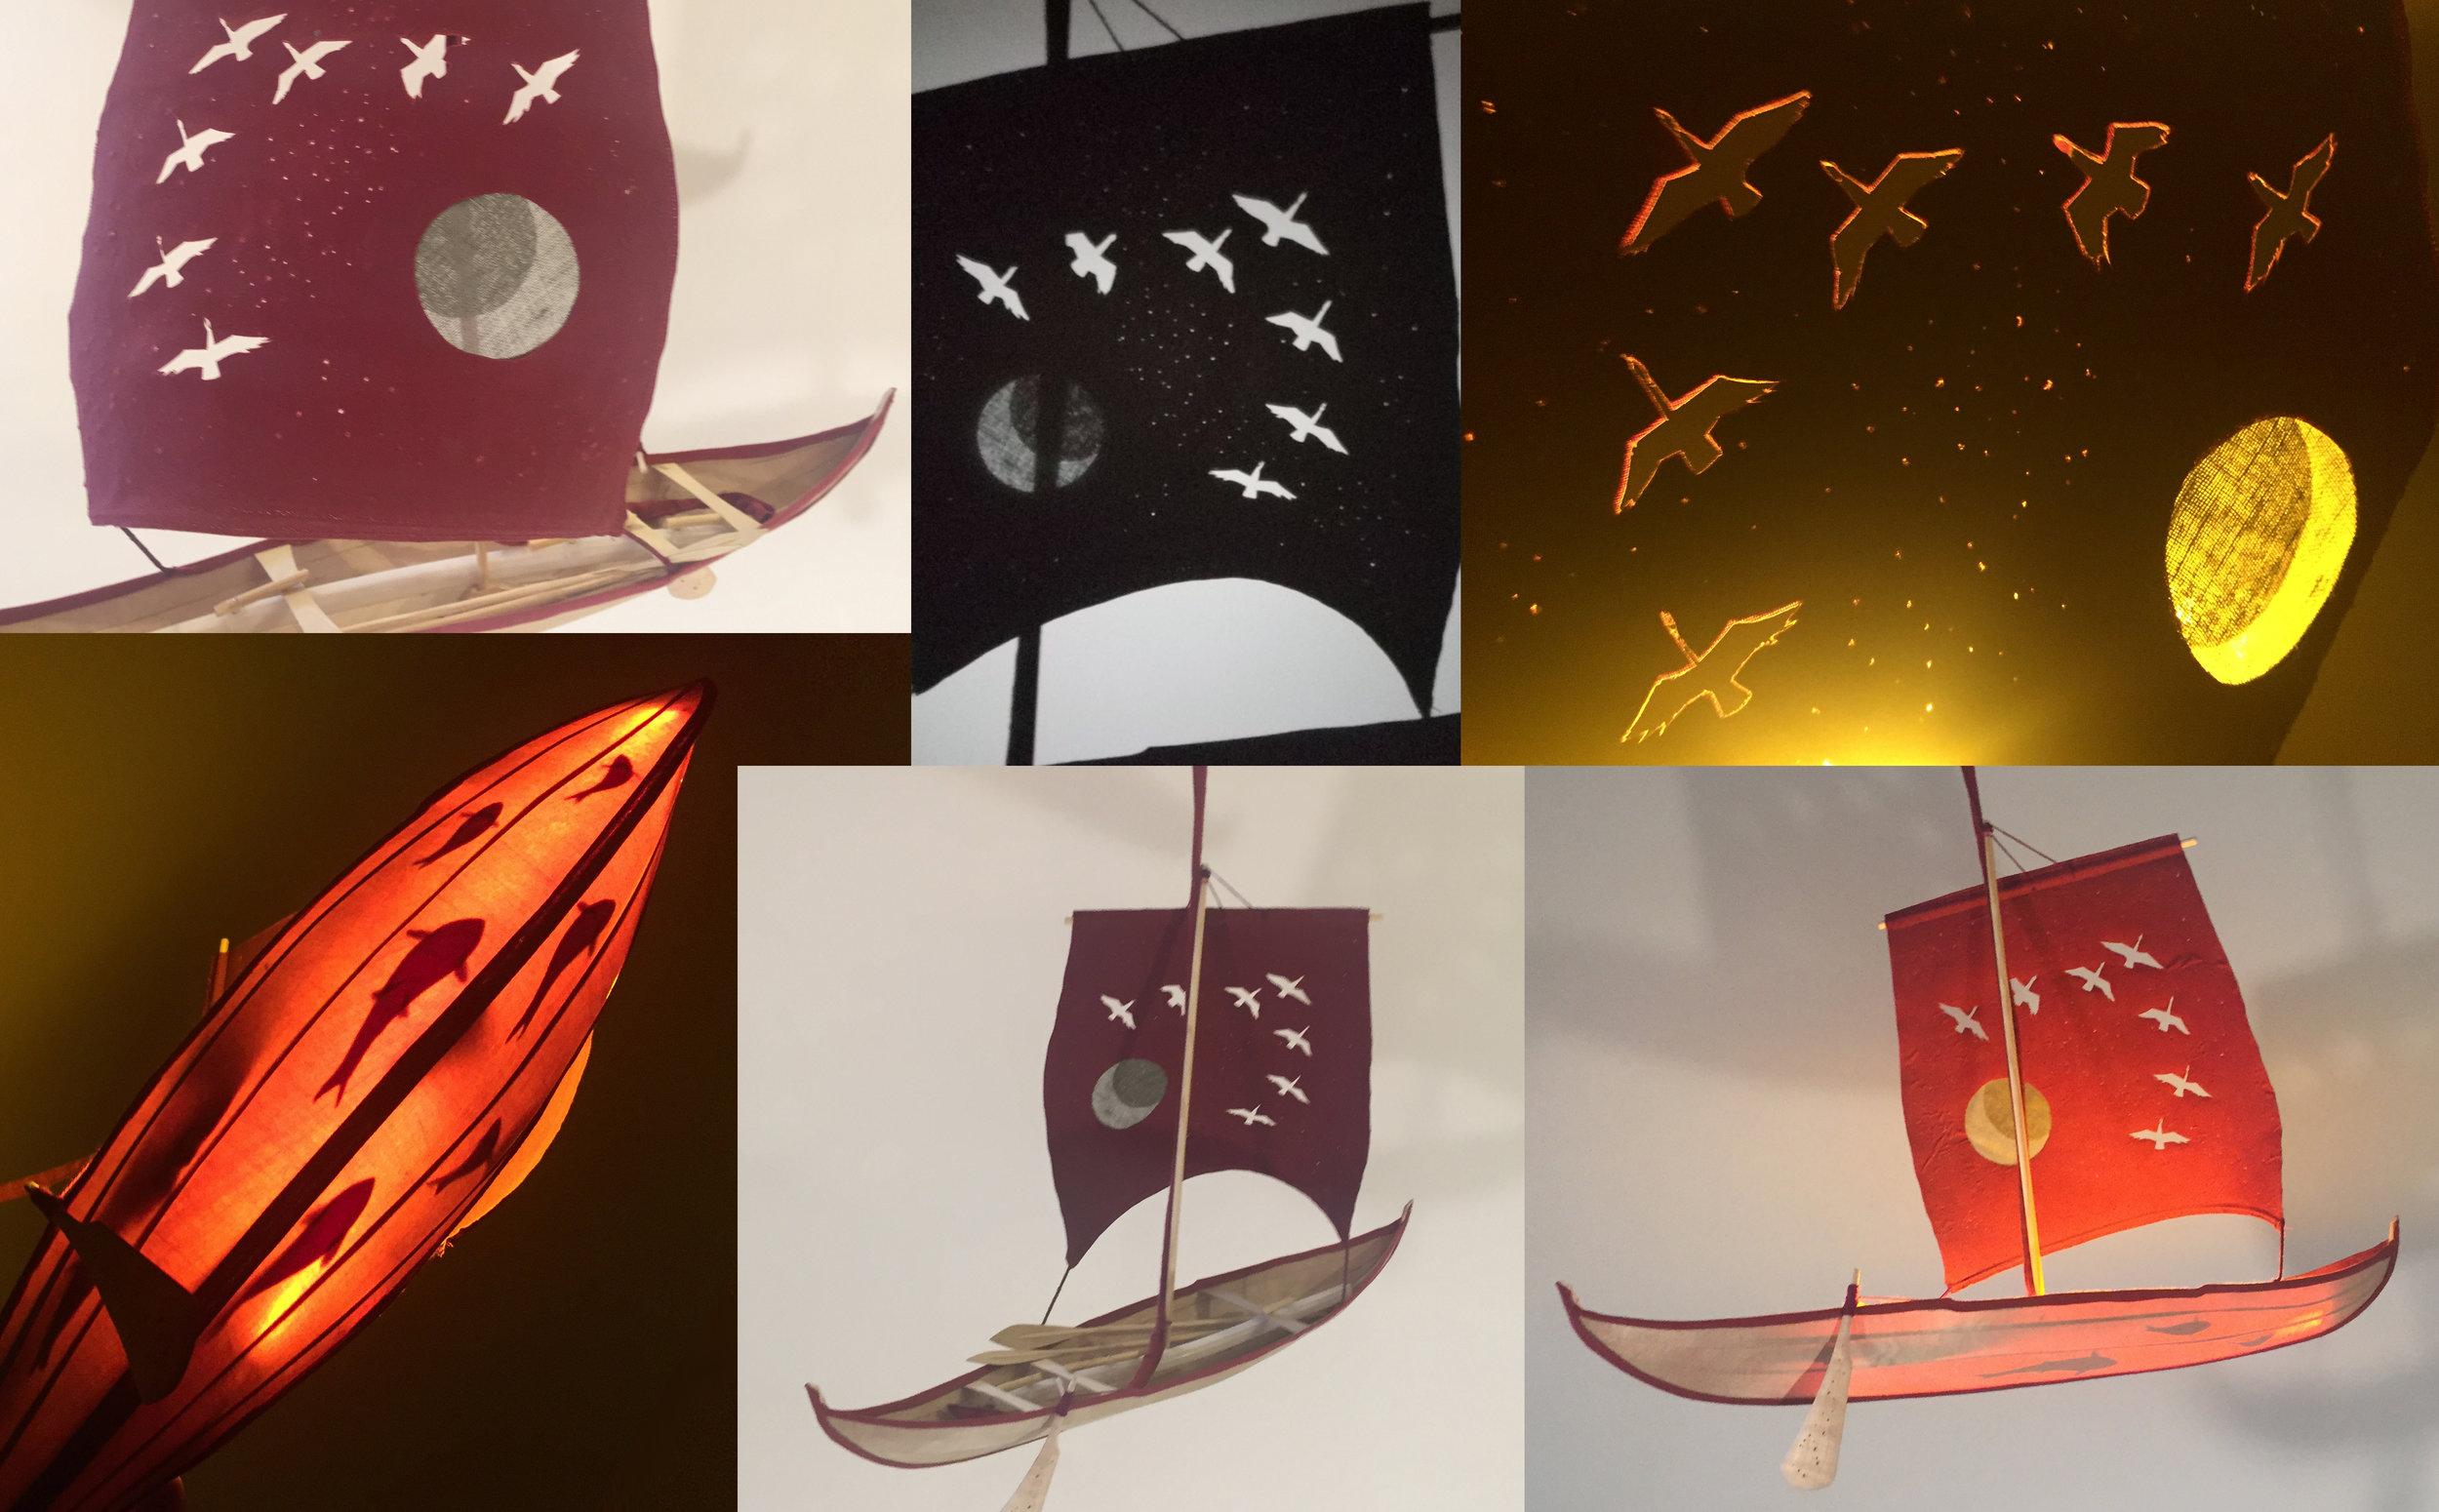 Faering - Goose, Fish, Star Moon